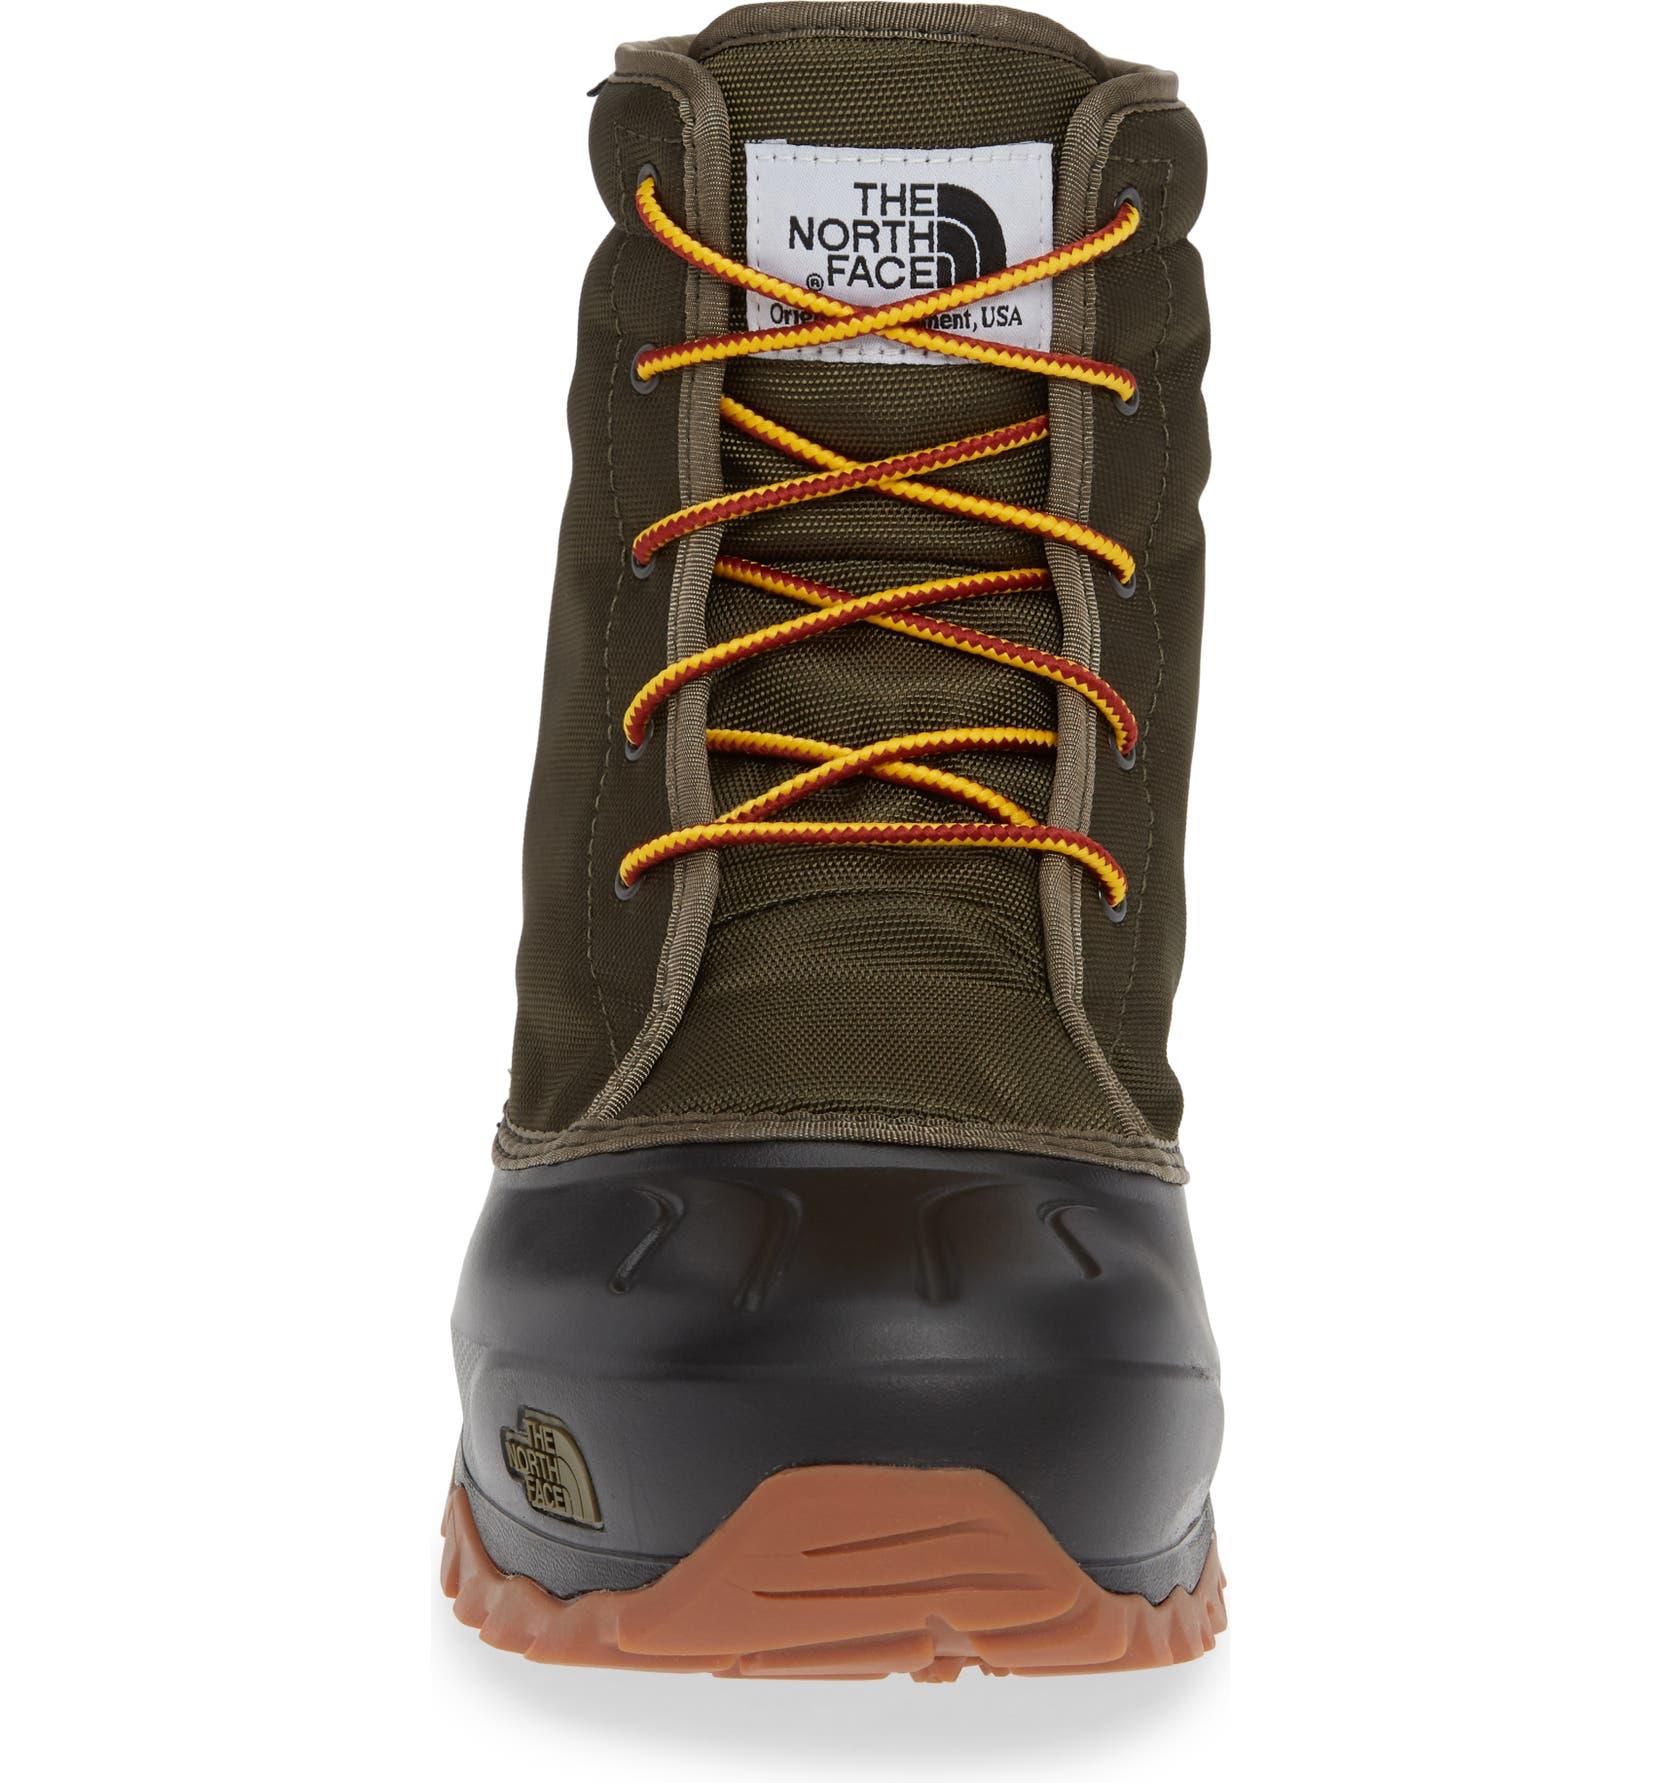 Boot Bottes North Face Men's Tsumoru The m8yvNn0PwO